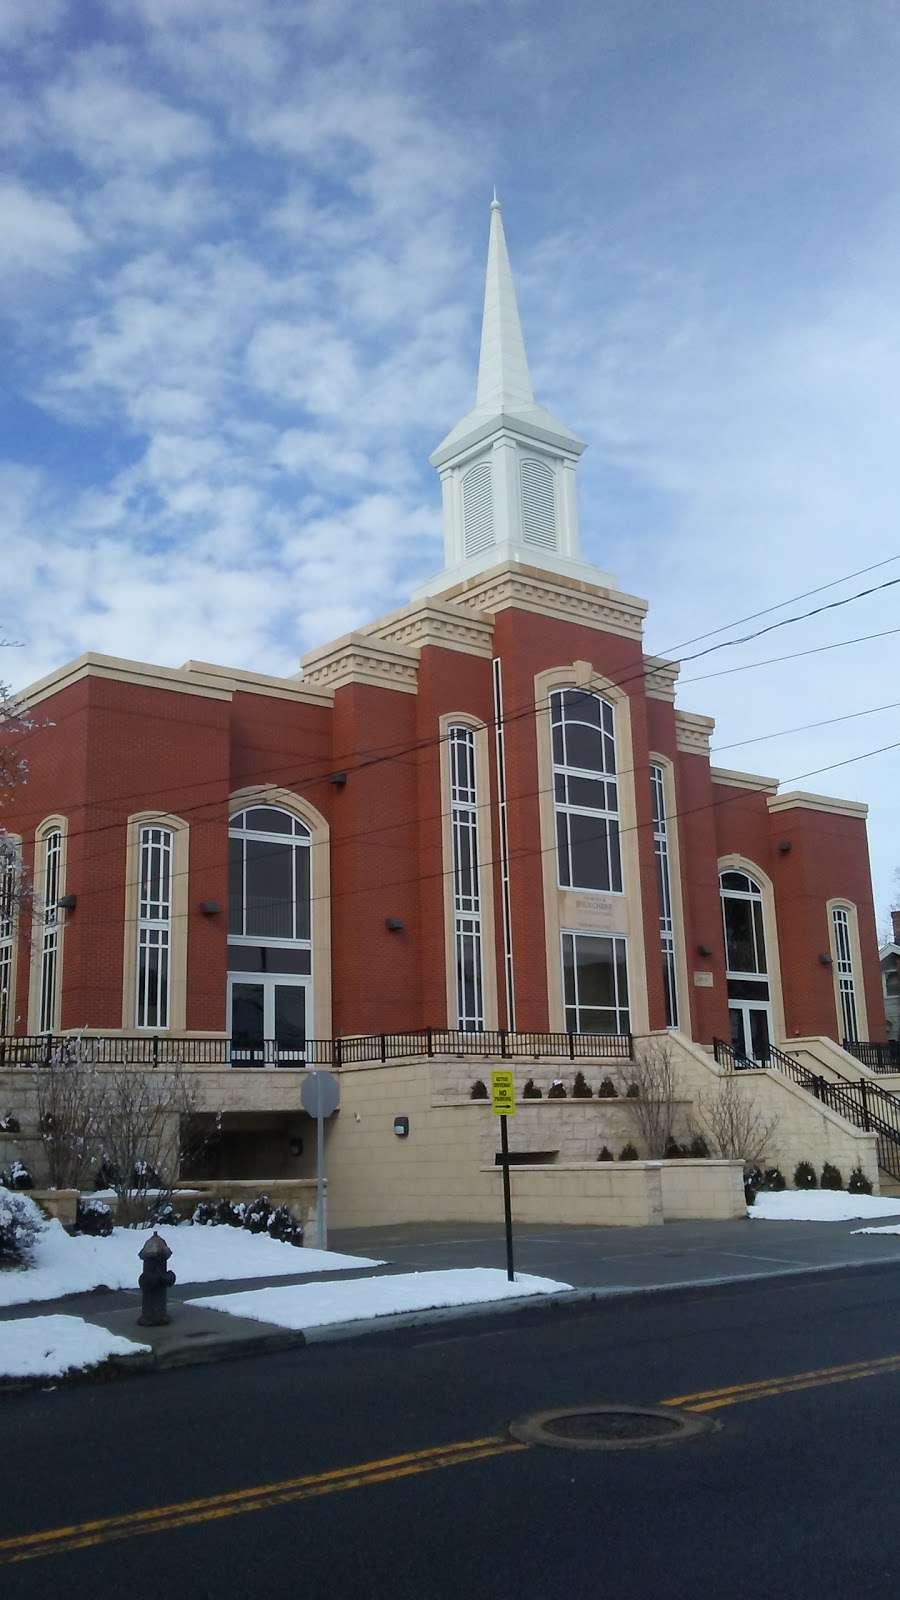 Lynbrook New York Stake Center - church    Photo 3 of 5   Address: 145-15 33rd Ave, Flushing, NY 11354, USA